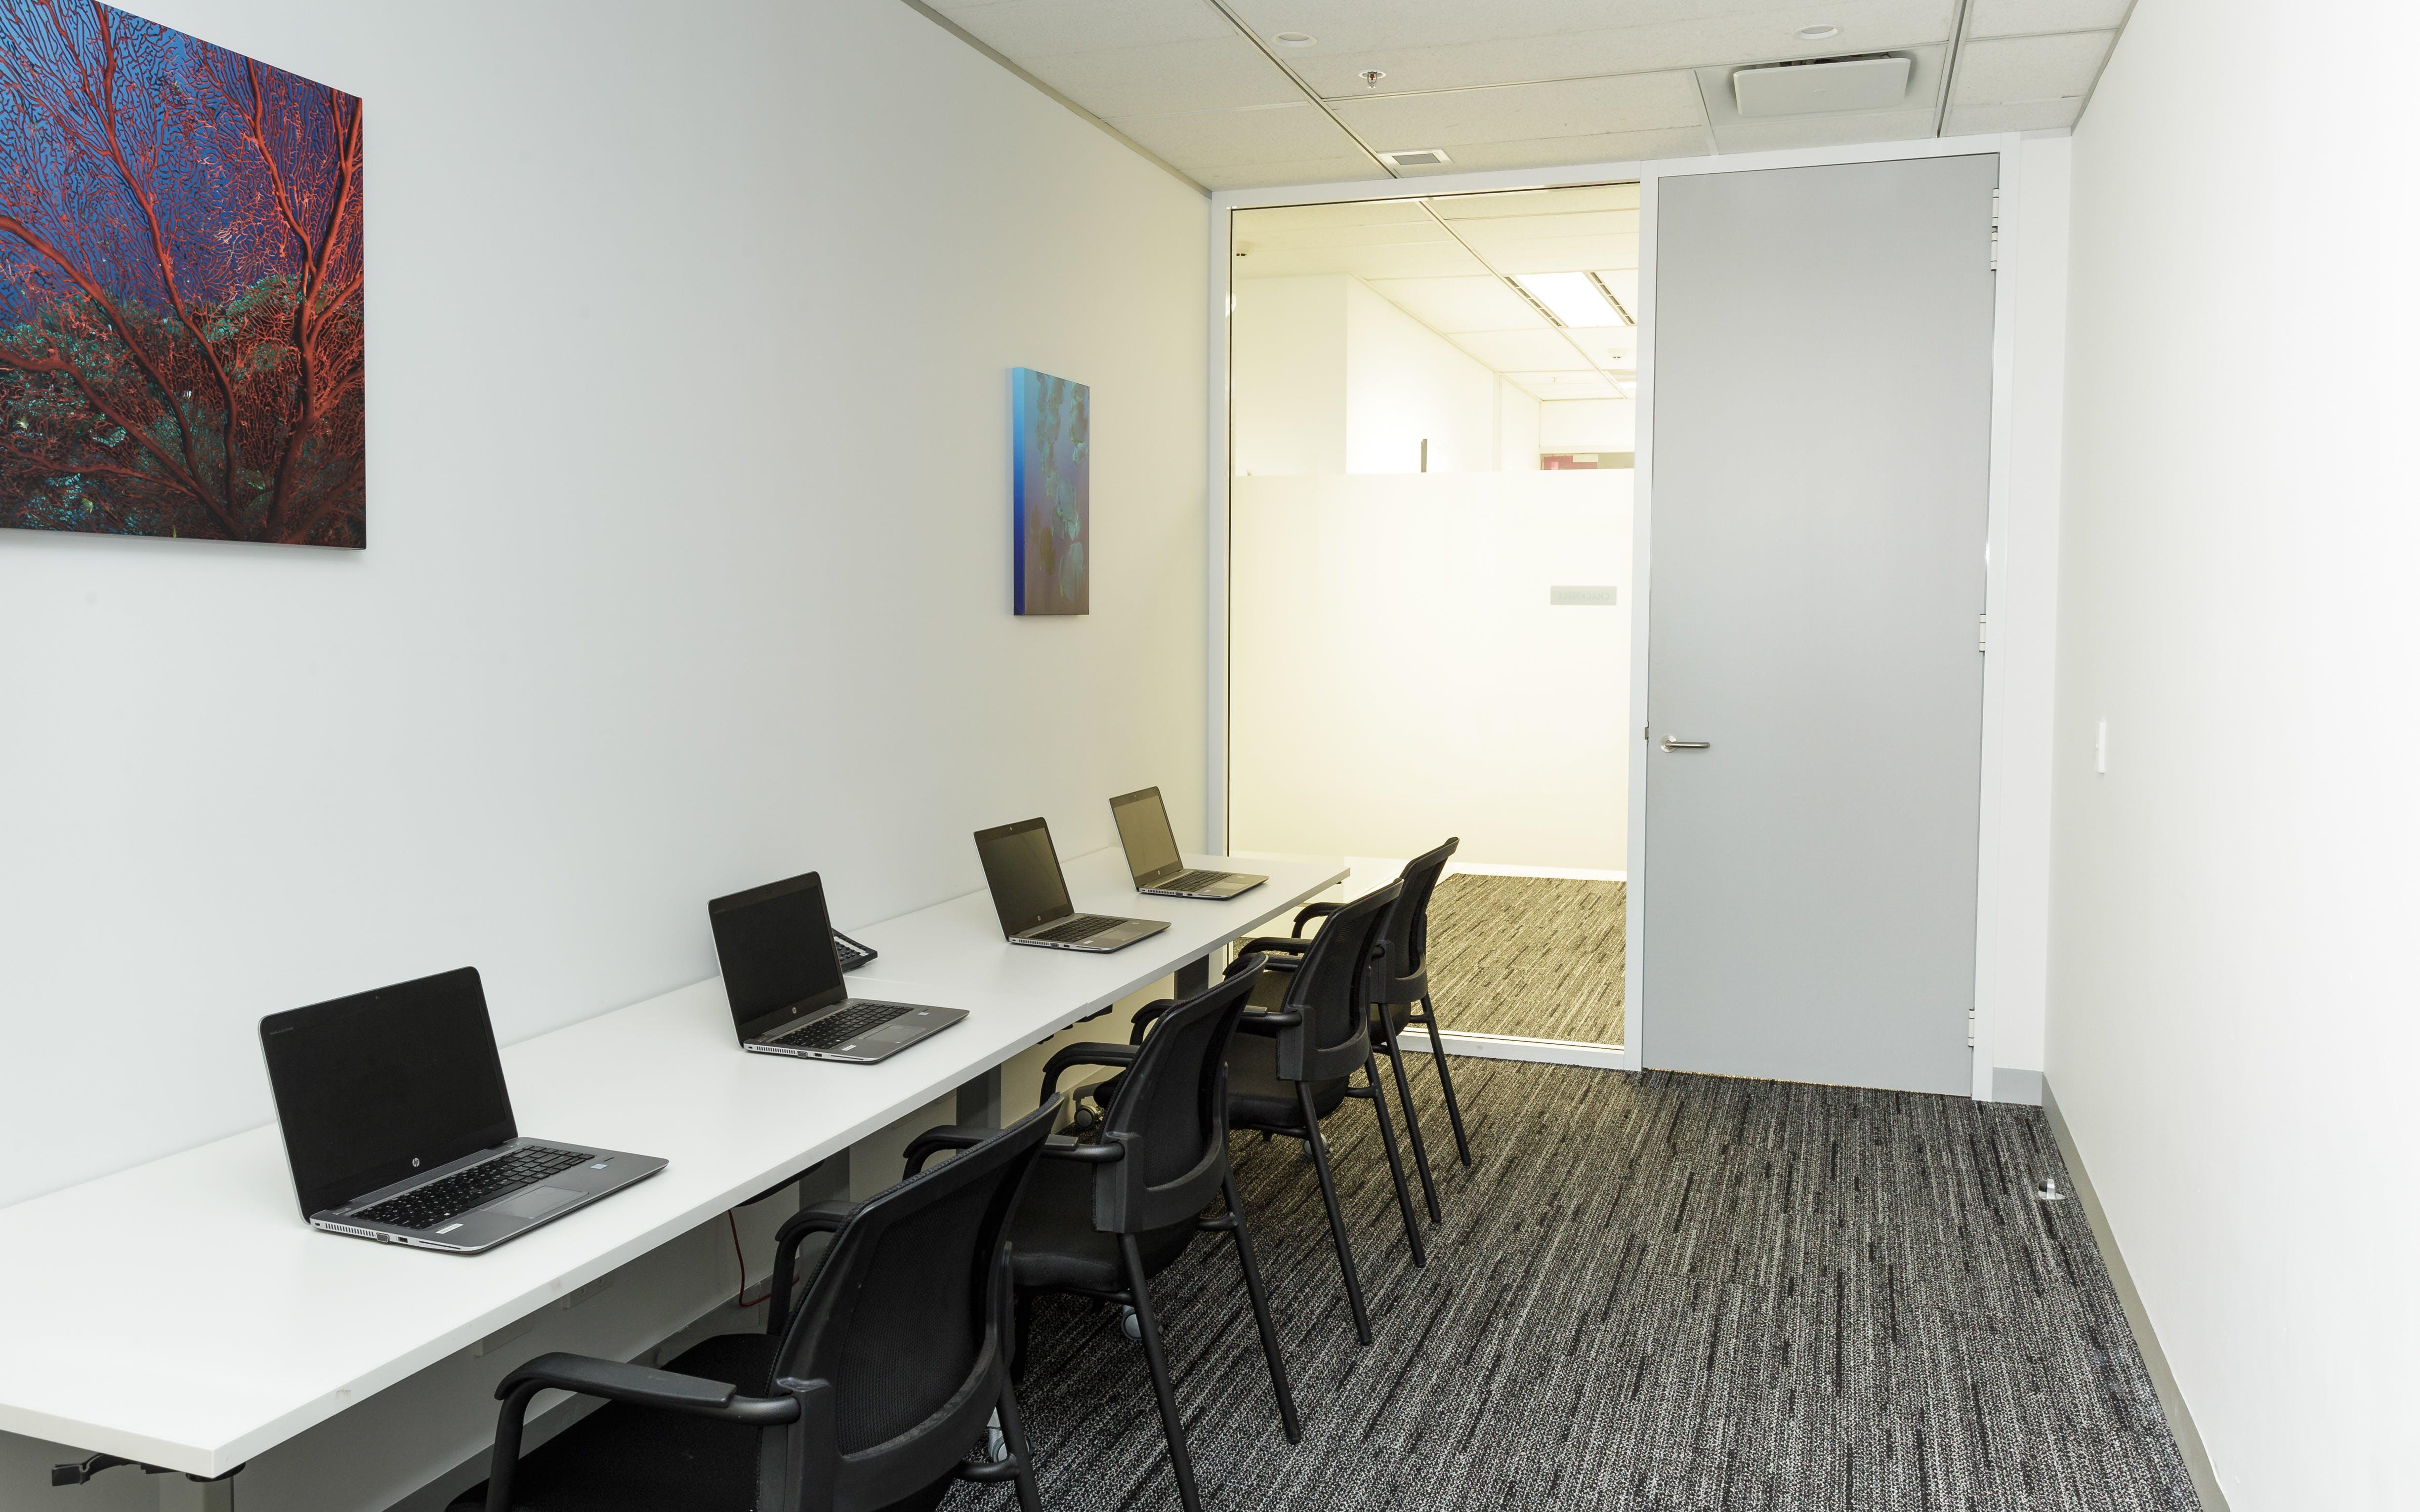 Cracknell: 4-6 Person Serviced Office near Sydney CBD, image 1